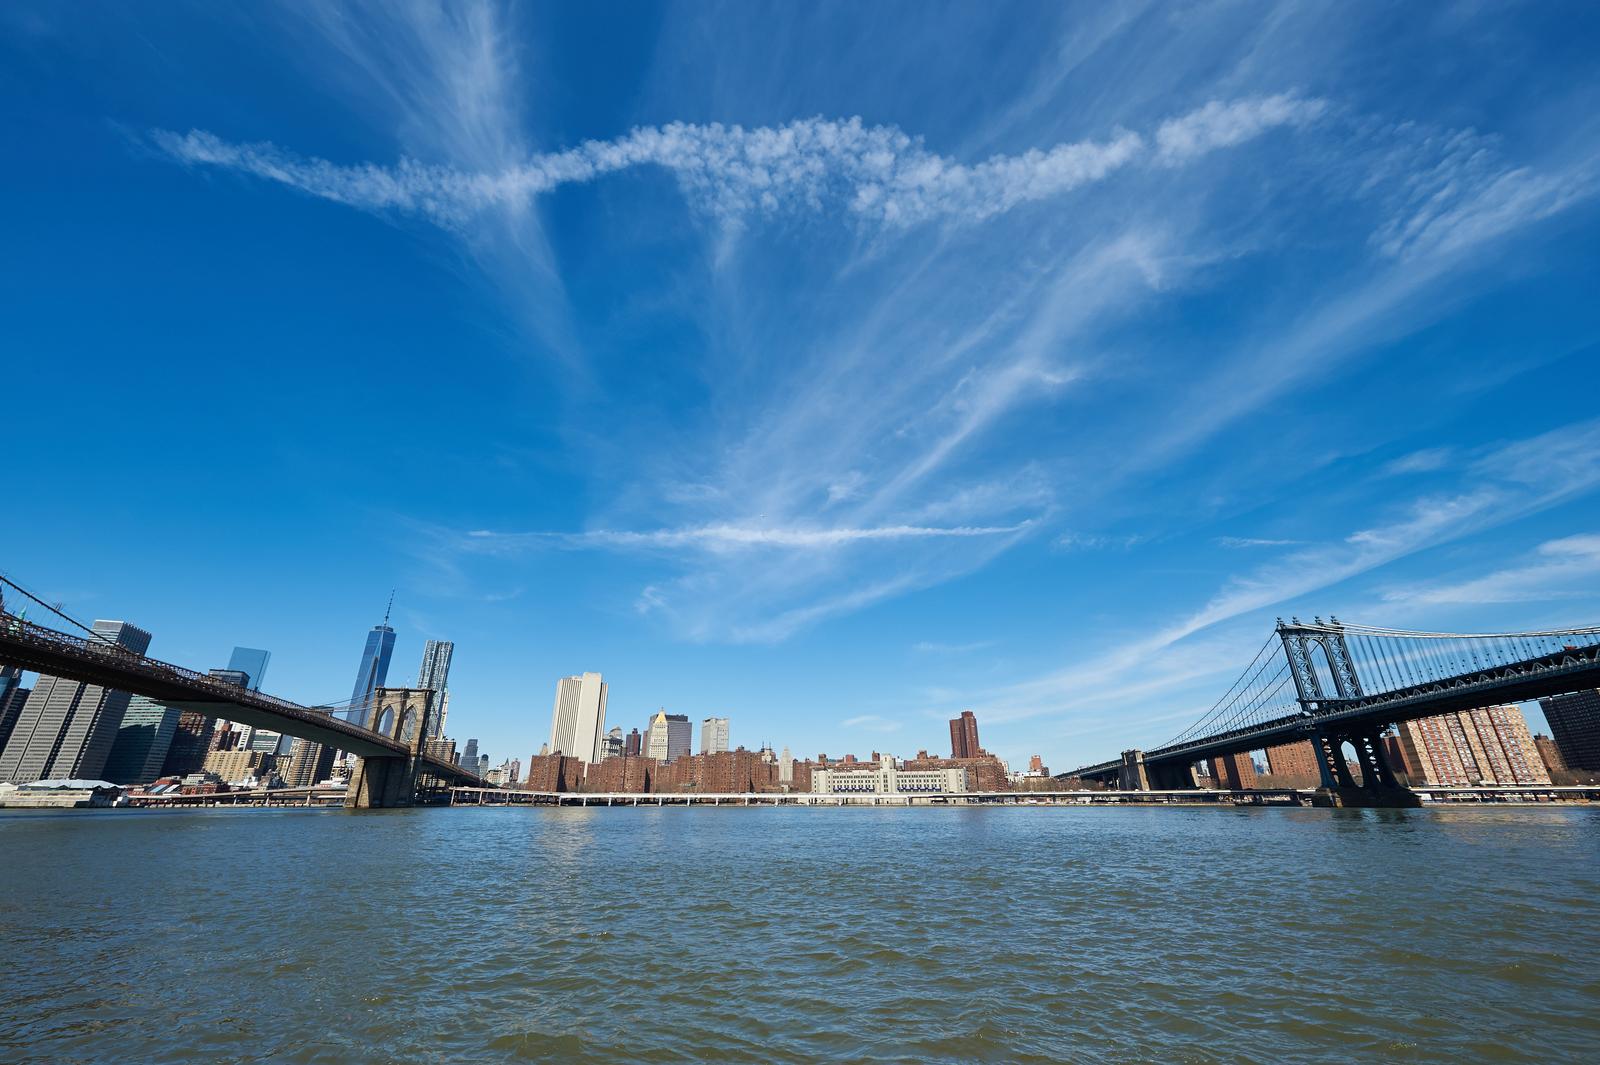 Five Points Manhattan, NY Private Investigator